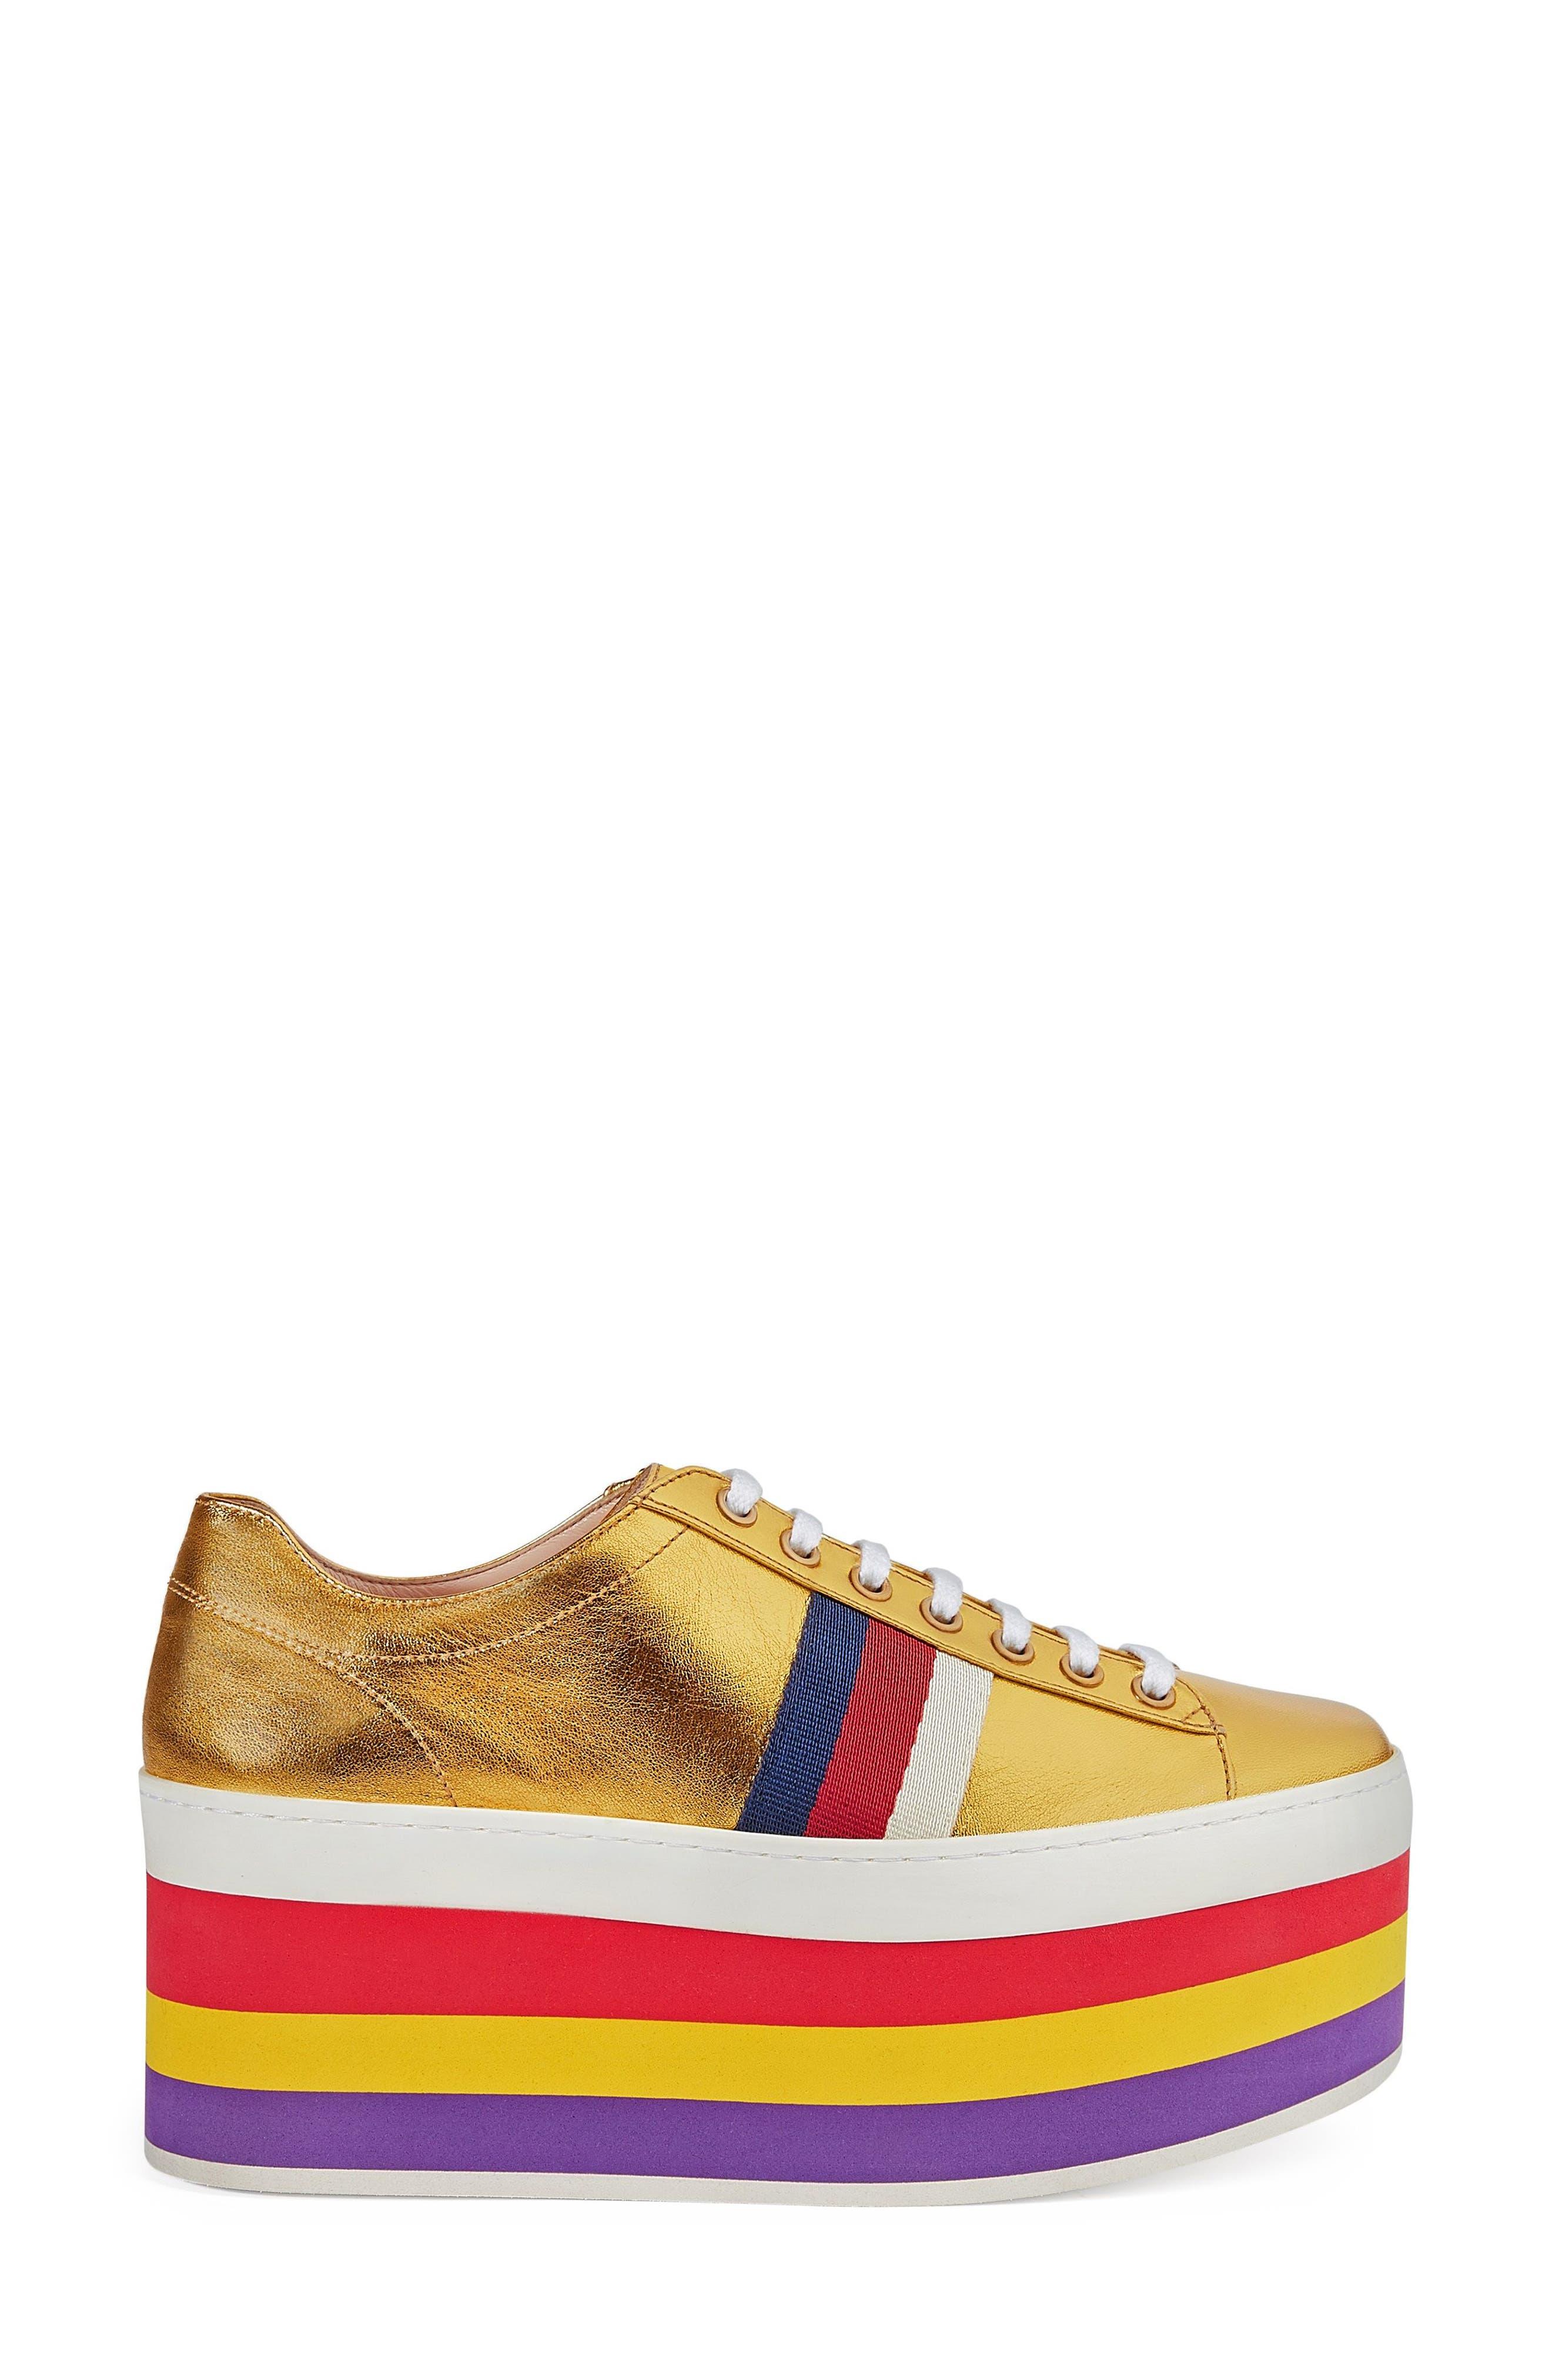 Alternate Image 1 Selected - Gucci Peggy Flatform Sneaker (Women)